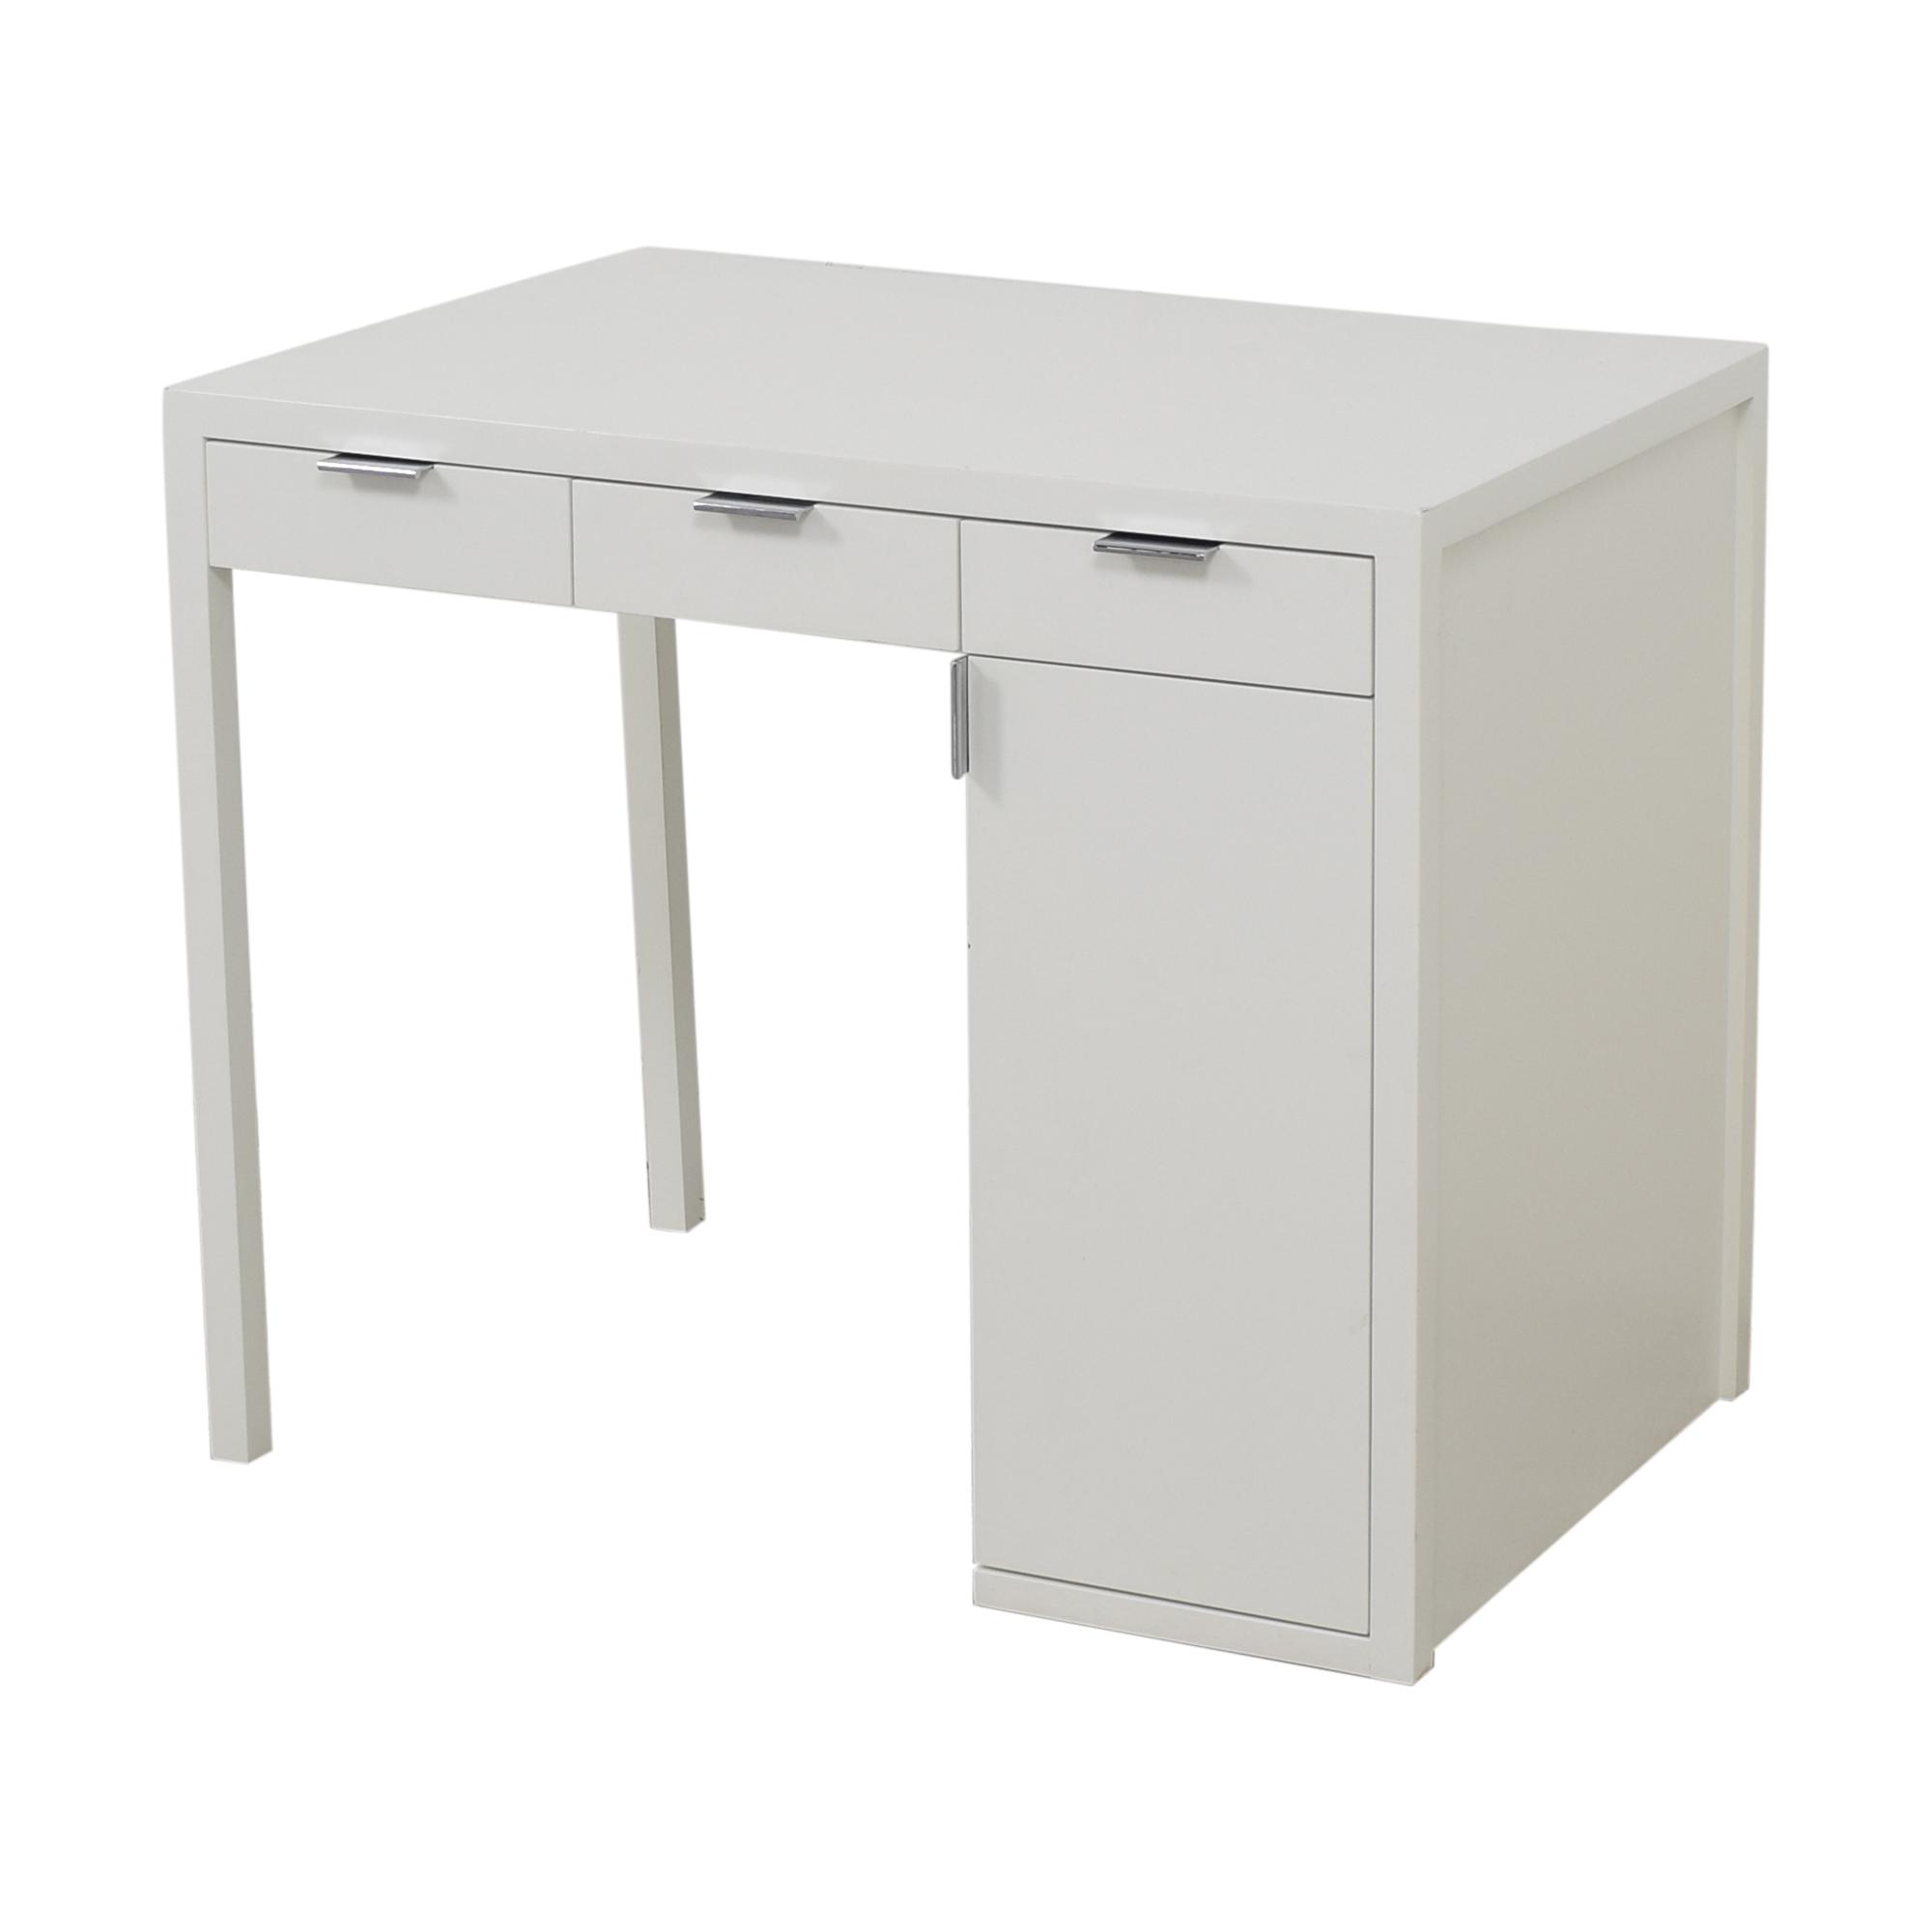 Custom Desk with Storage white